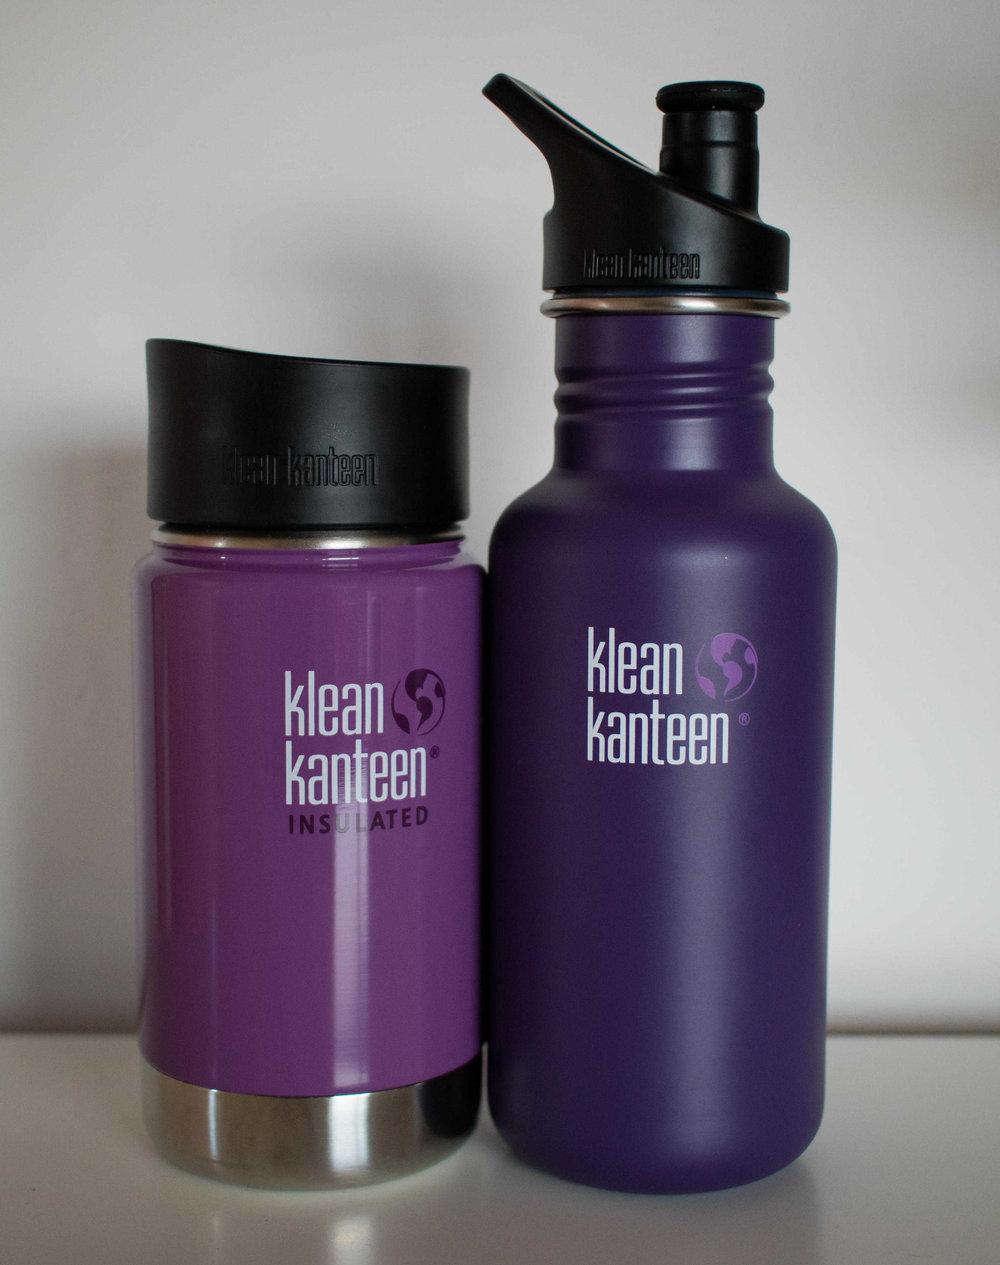 My two Klean Kanteens!